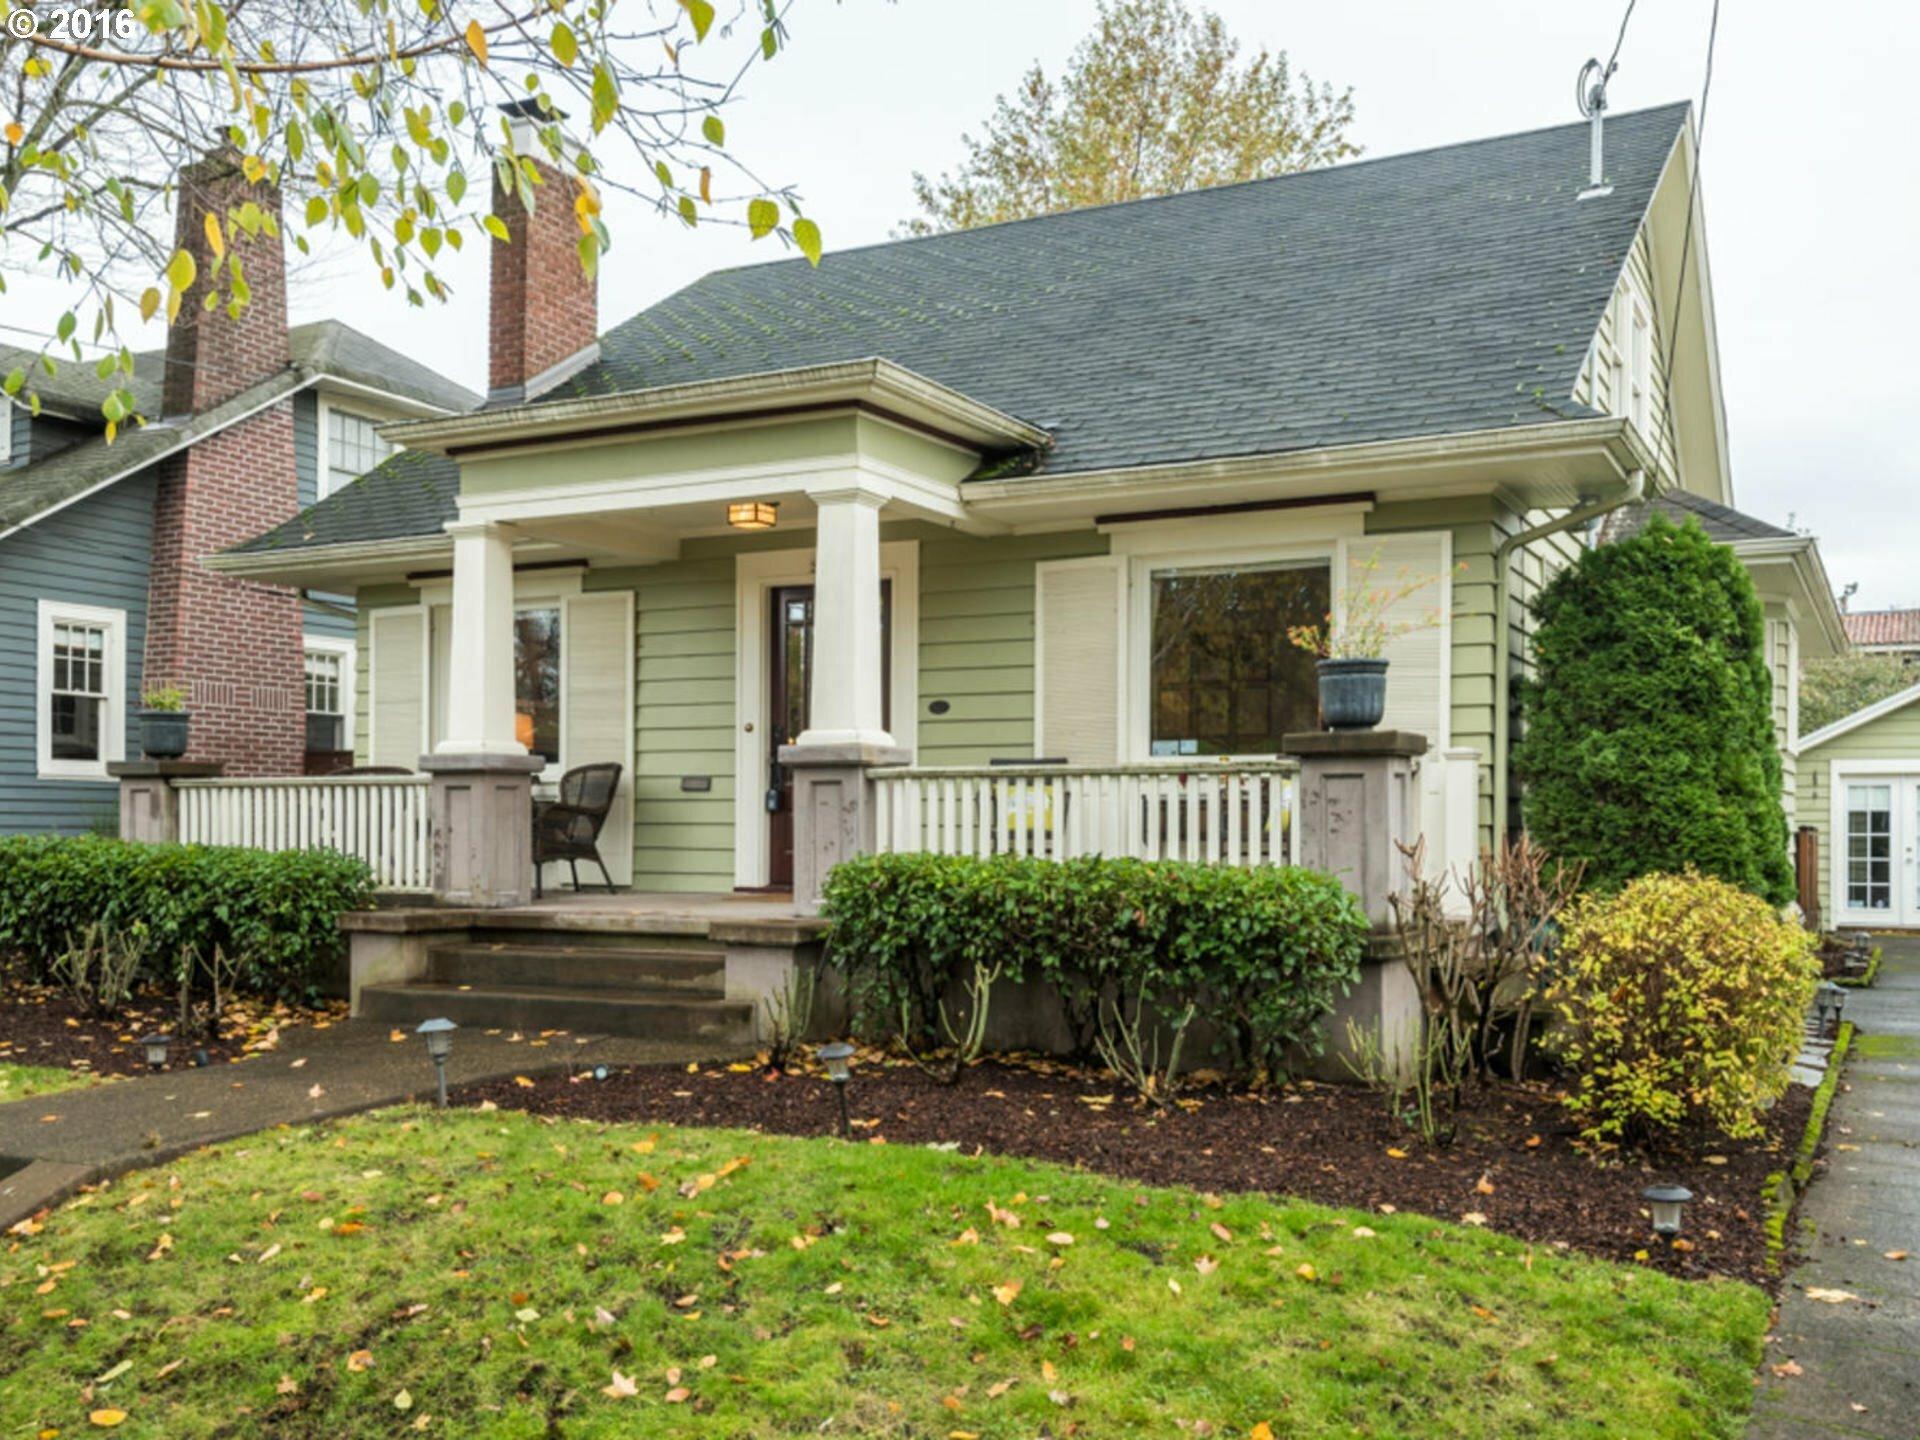 2924 Ne 22nd Ave, Portland, OR - USA (photo 1)